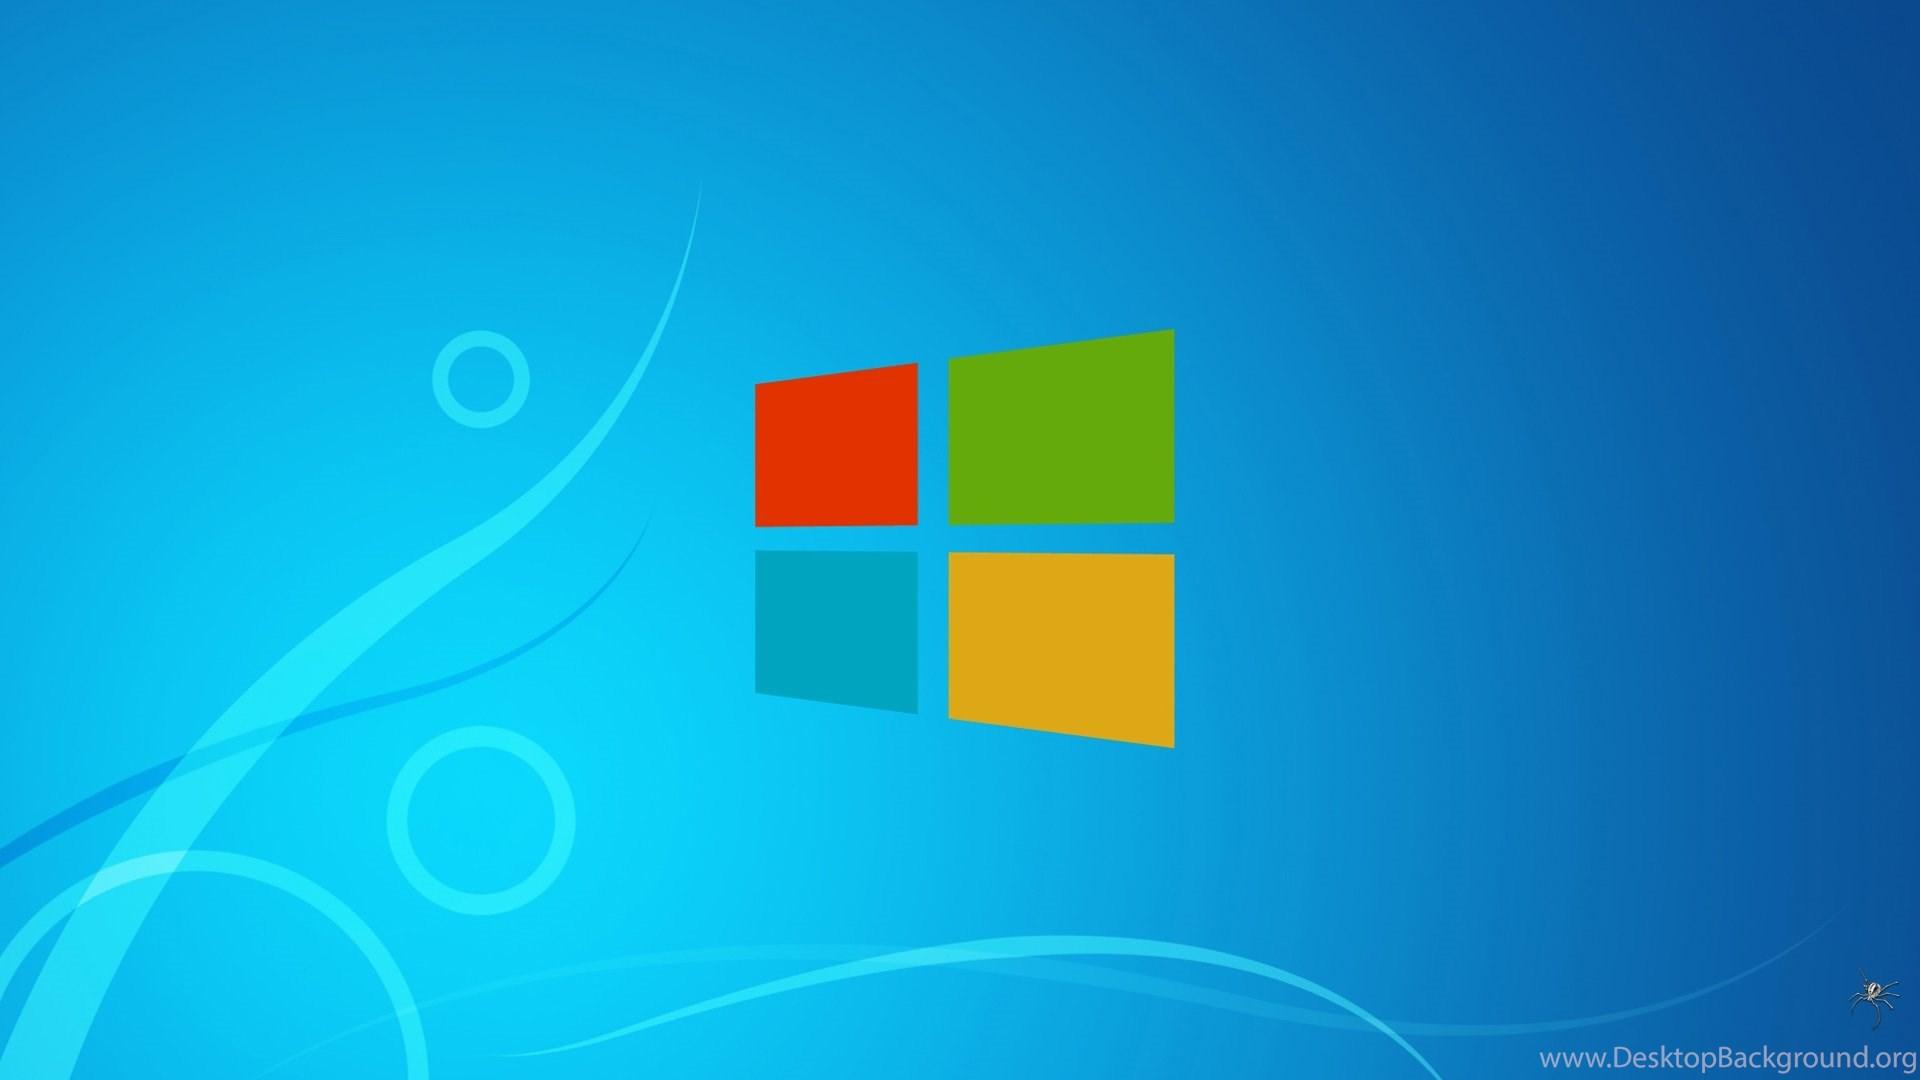 Windows 8 Pro Wallpapers WallDevil Best Free HD Desktop And